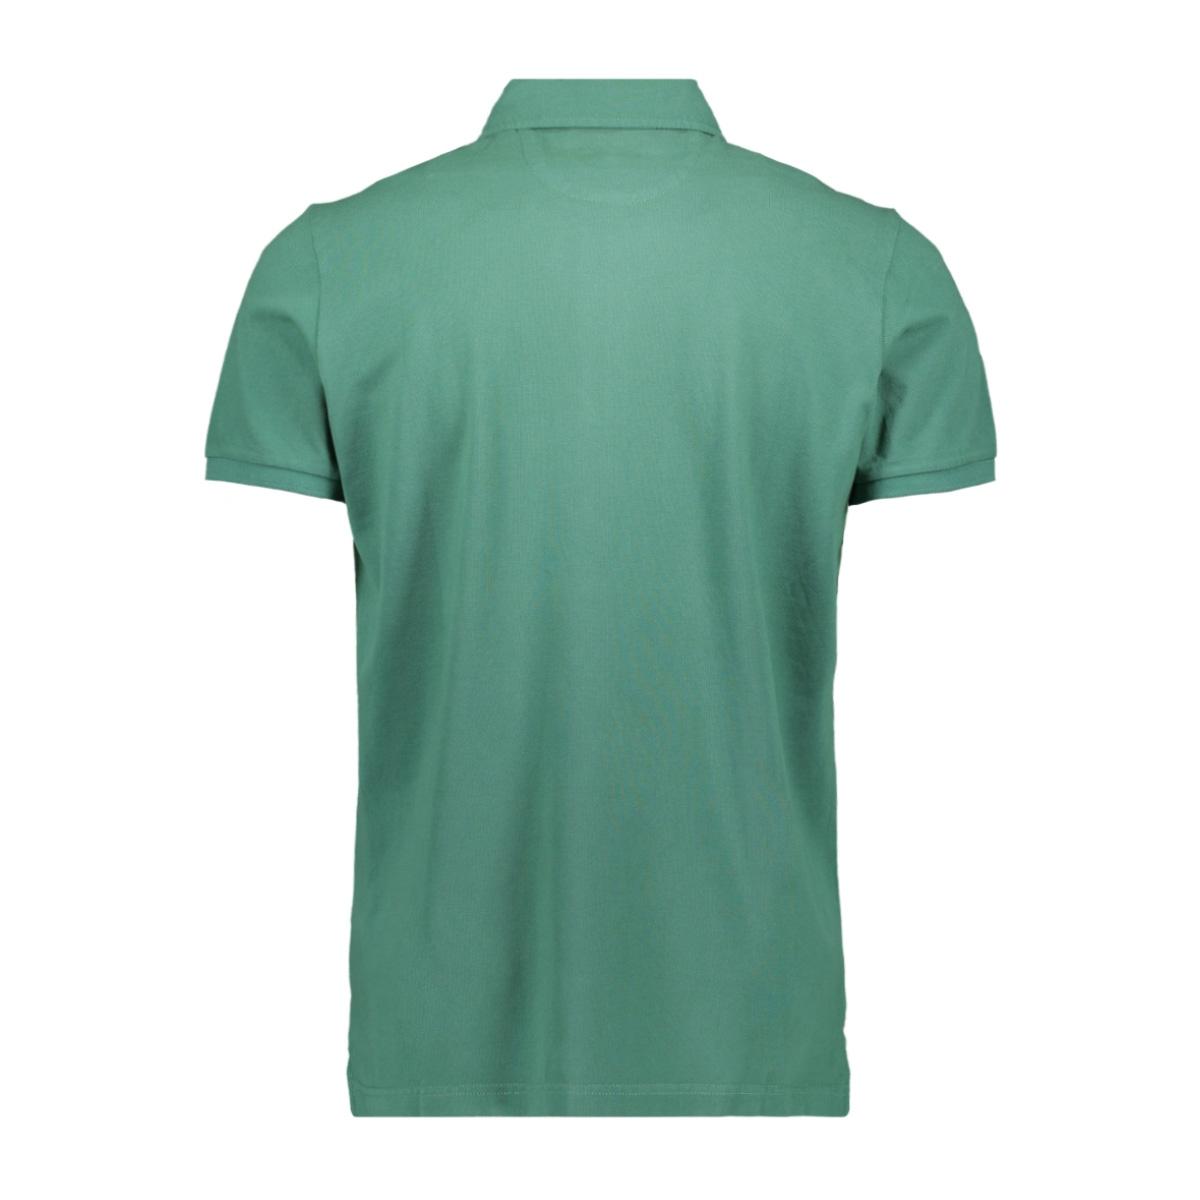 karoro 19bn100 nza polo 485 dusty green